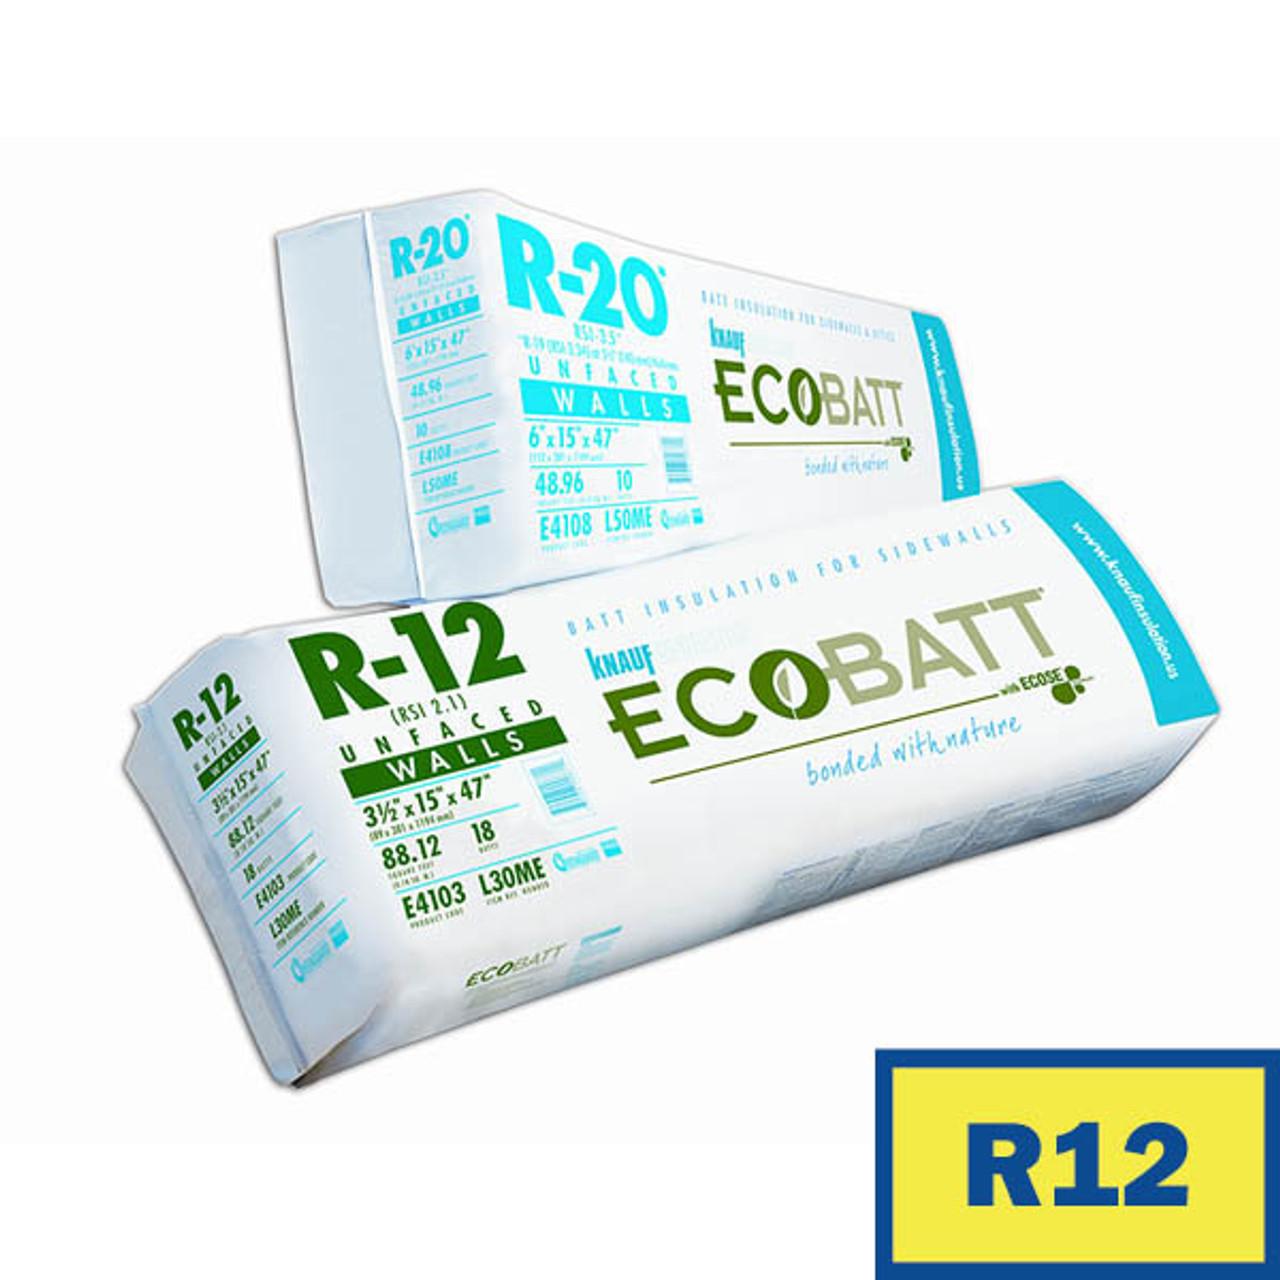 Knauf ECOBATT Insulation | R12 x 15 | 127.29 Sq.Ft. Per Bundle